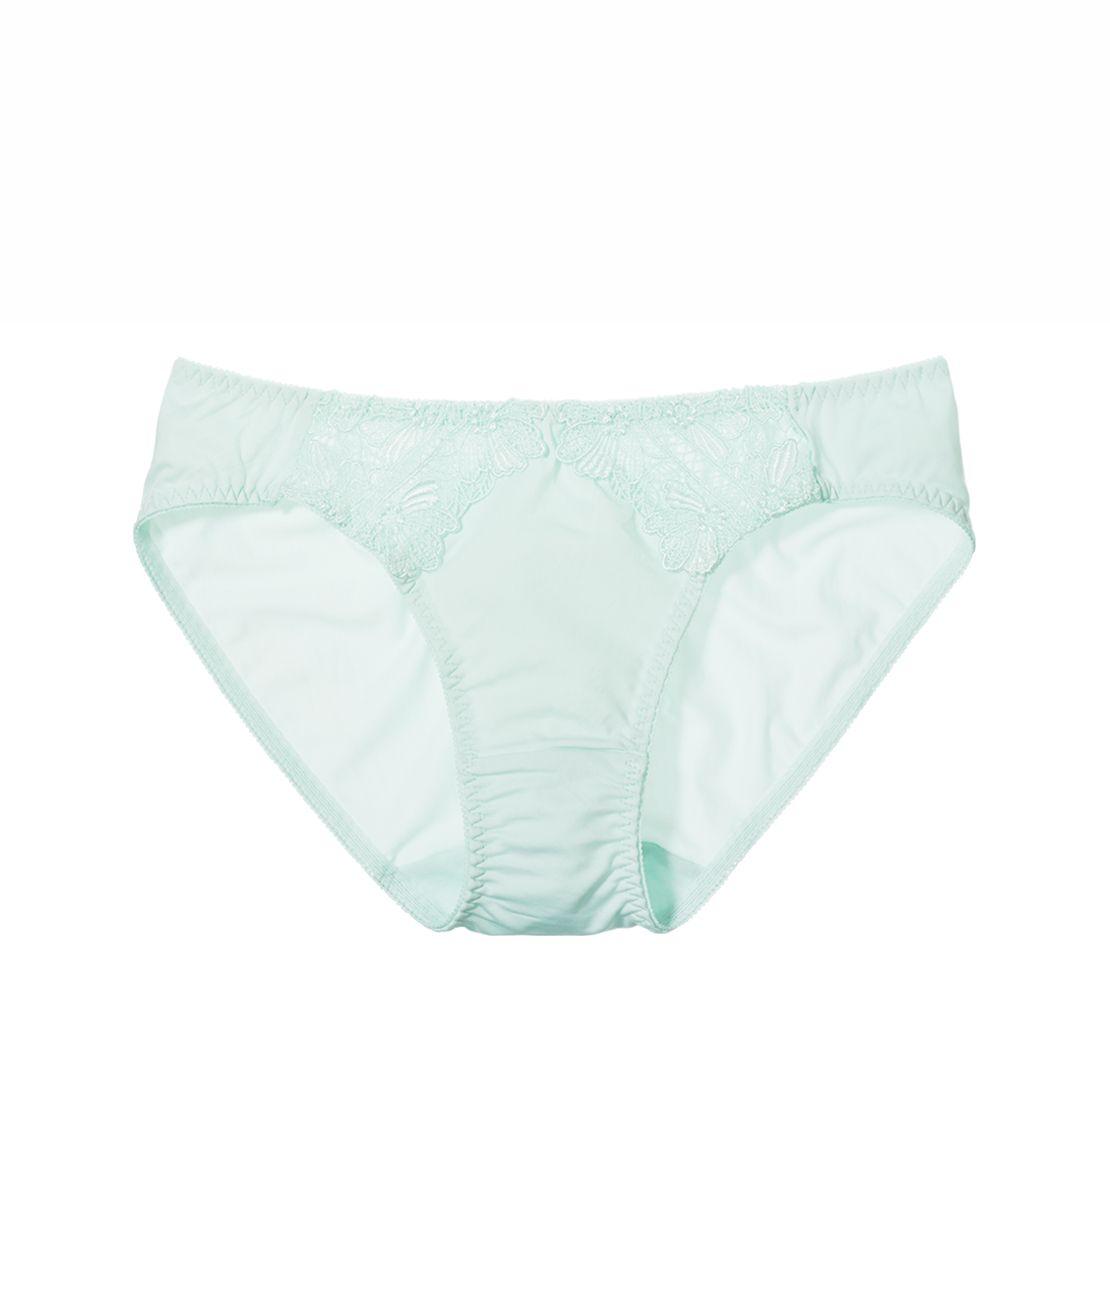 PJ天的夏季花園內褲